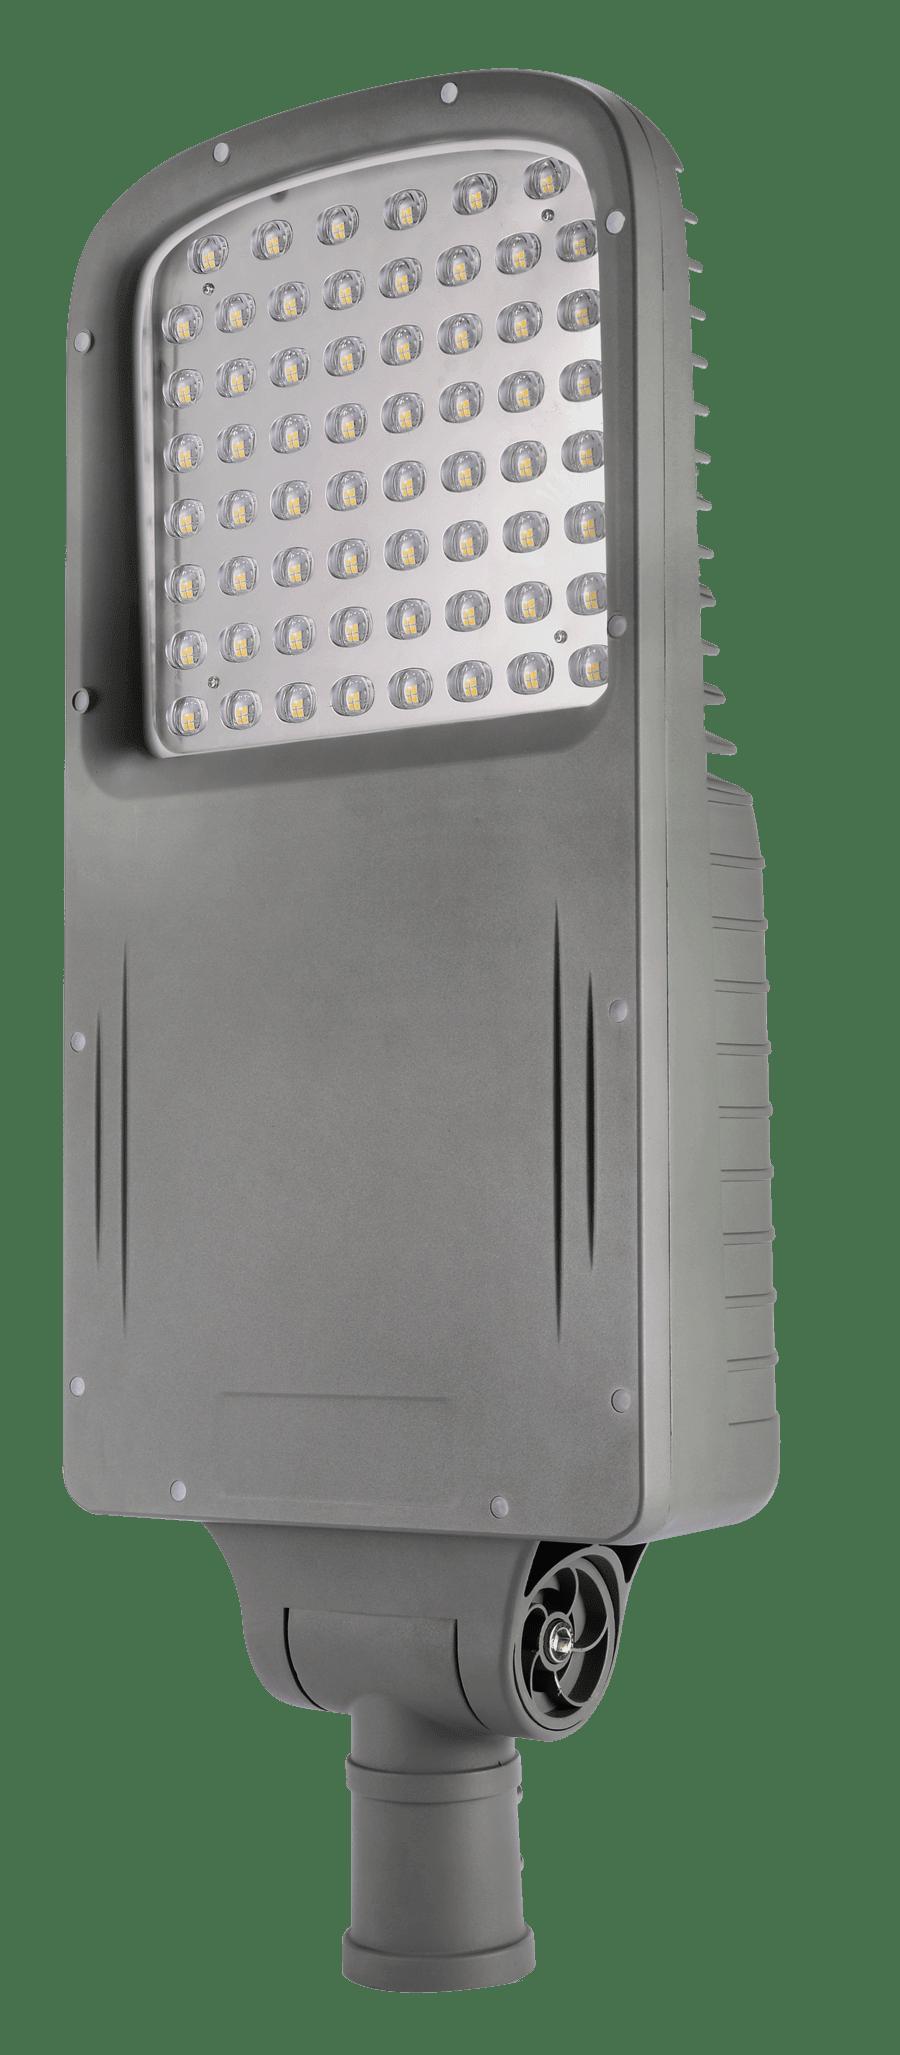 Luminaria Solar Panzer from solar-power